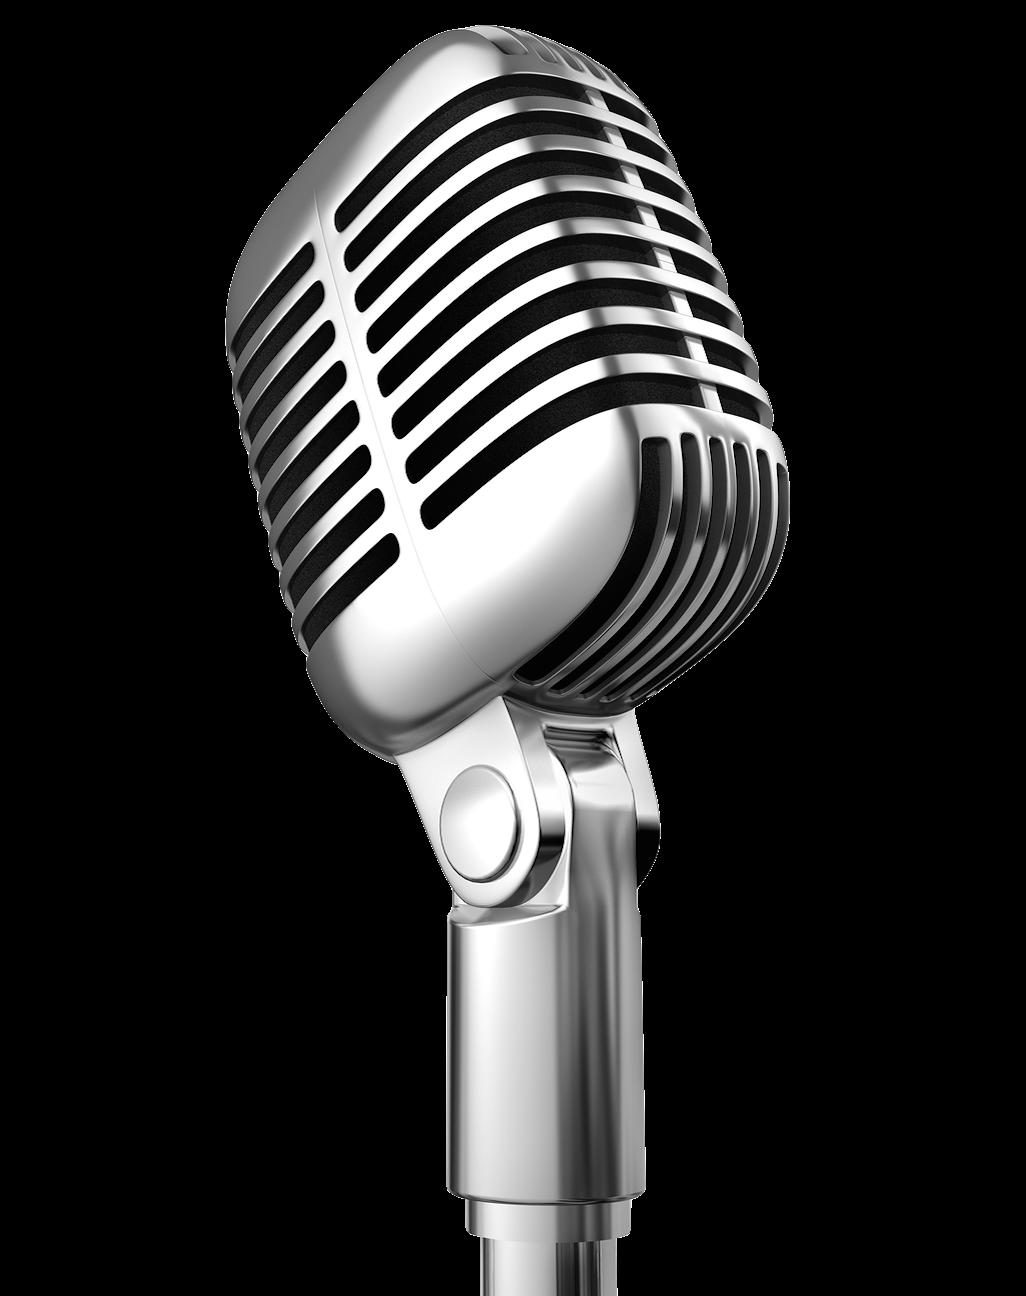 Musical clipart mic. Microphone music clip art